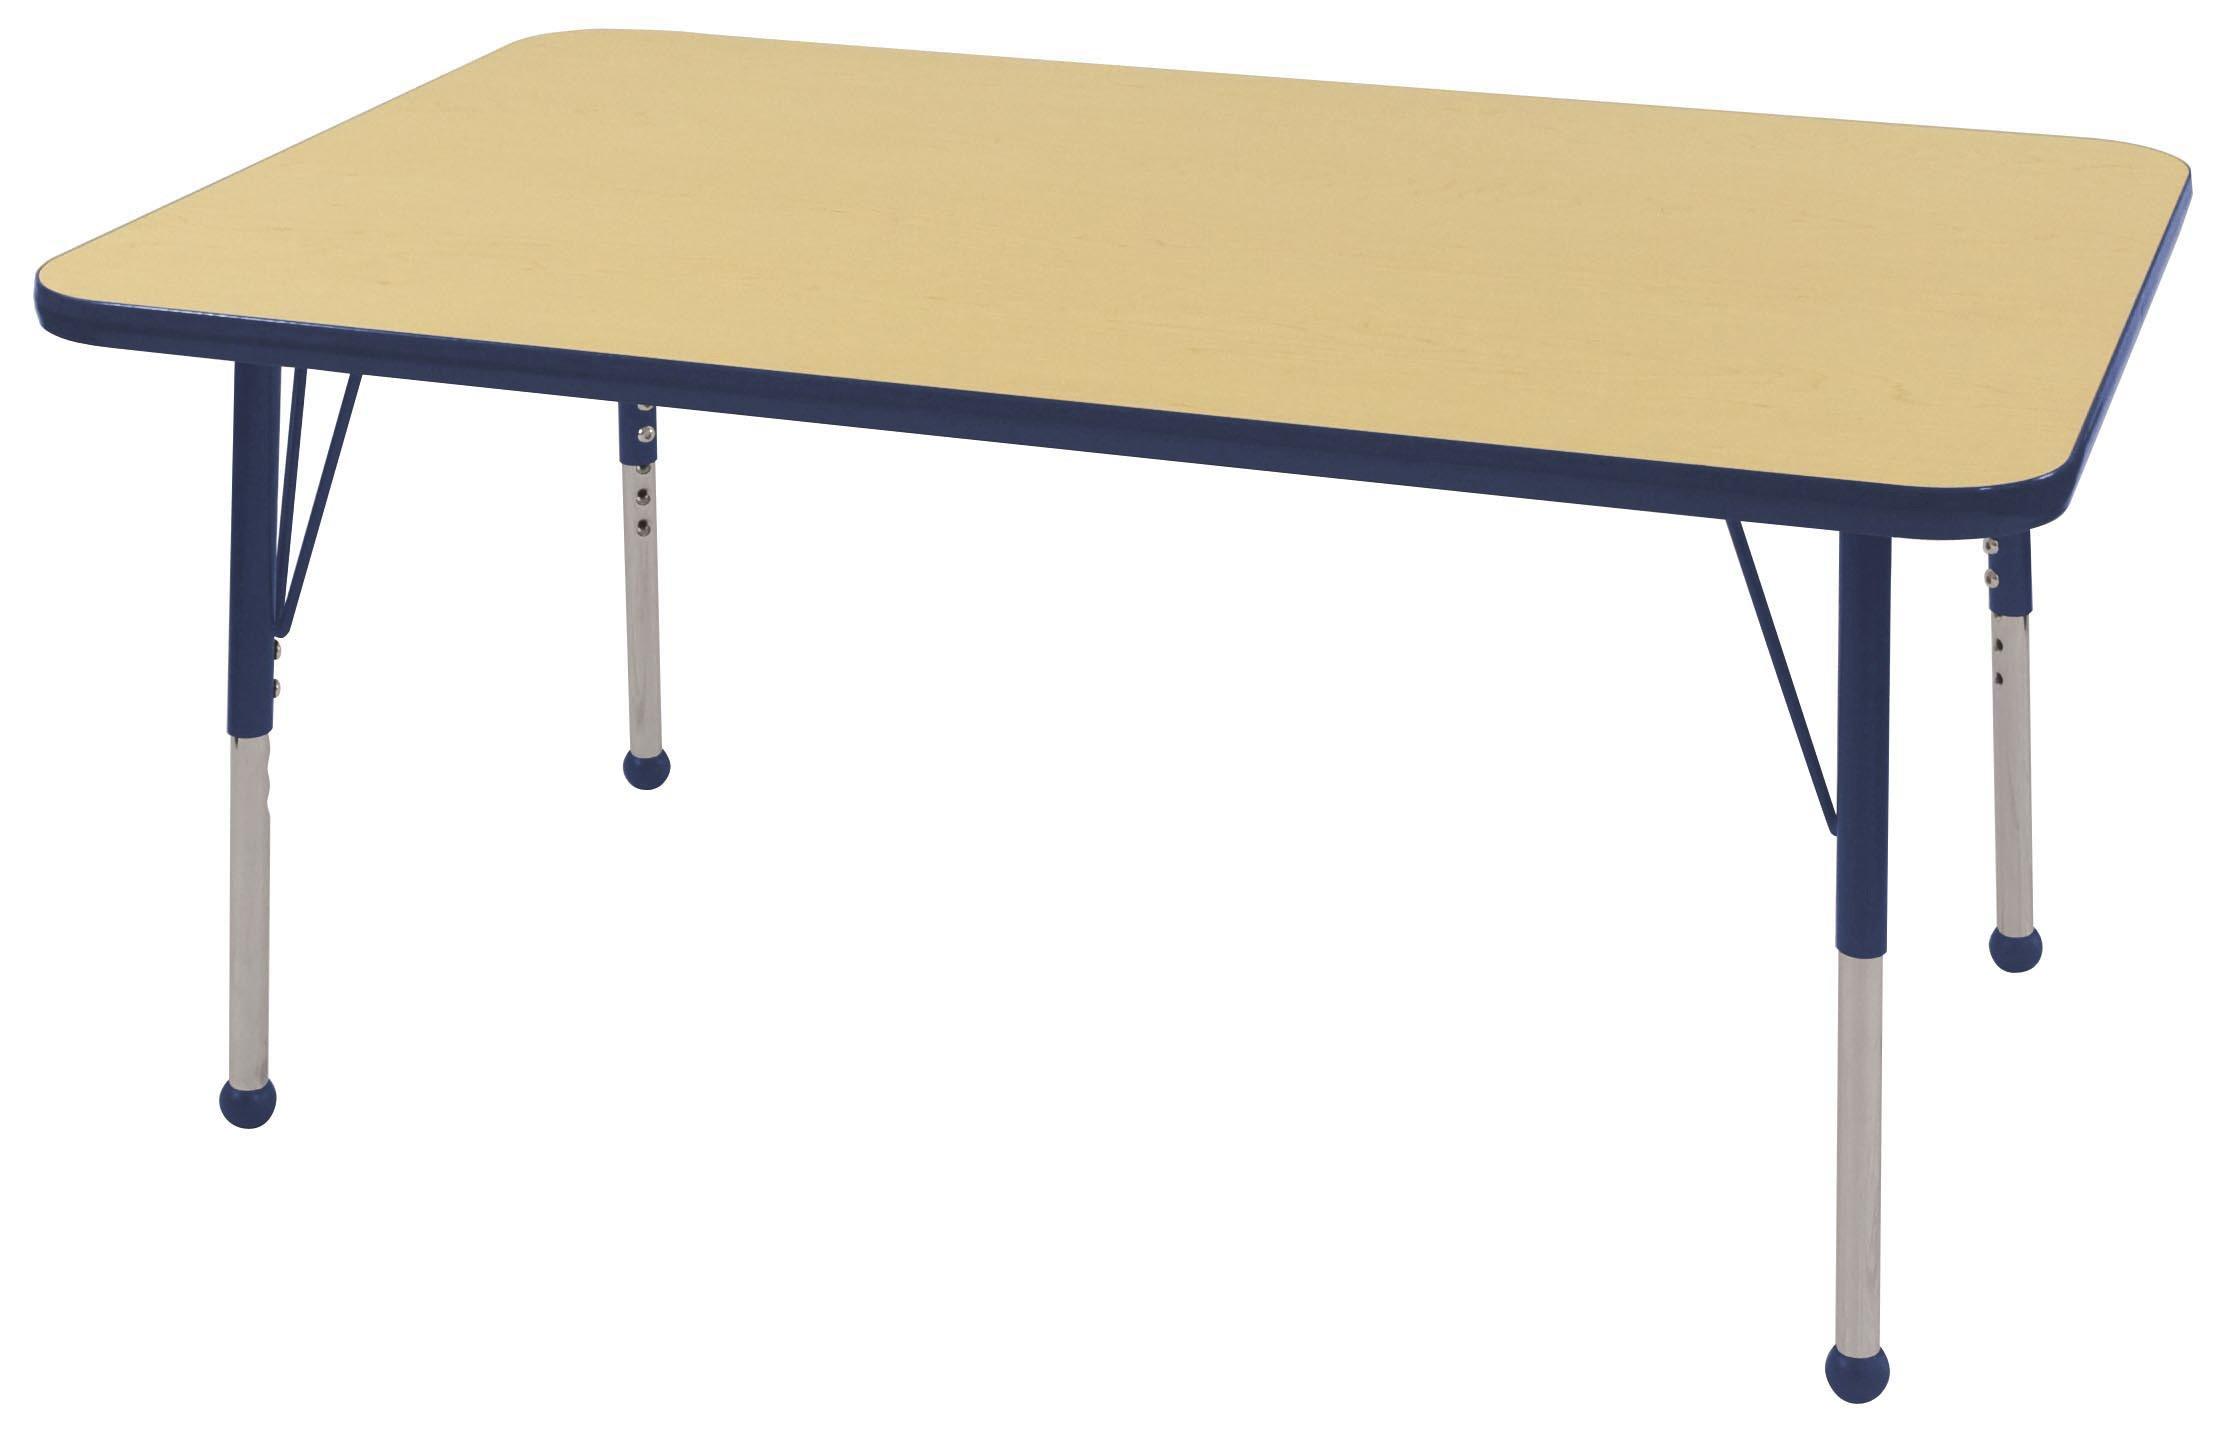 ECR4Kids Mesa T-Mold 30'' x 48'' Rectangular School Activity Table, Standard Legs w/ Ball Glides, Adjustable Height 19-30 inch (Maple/Navy)